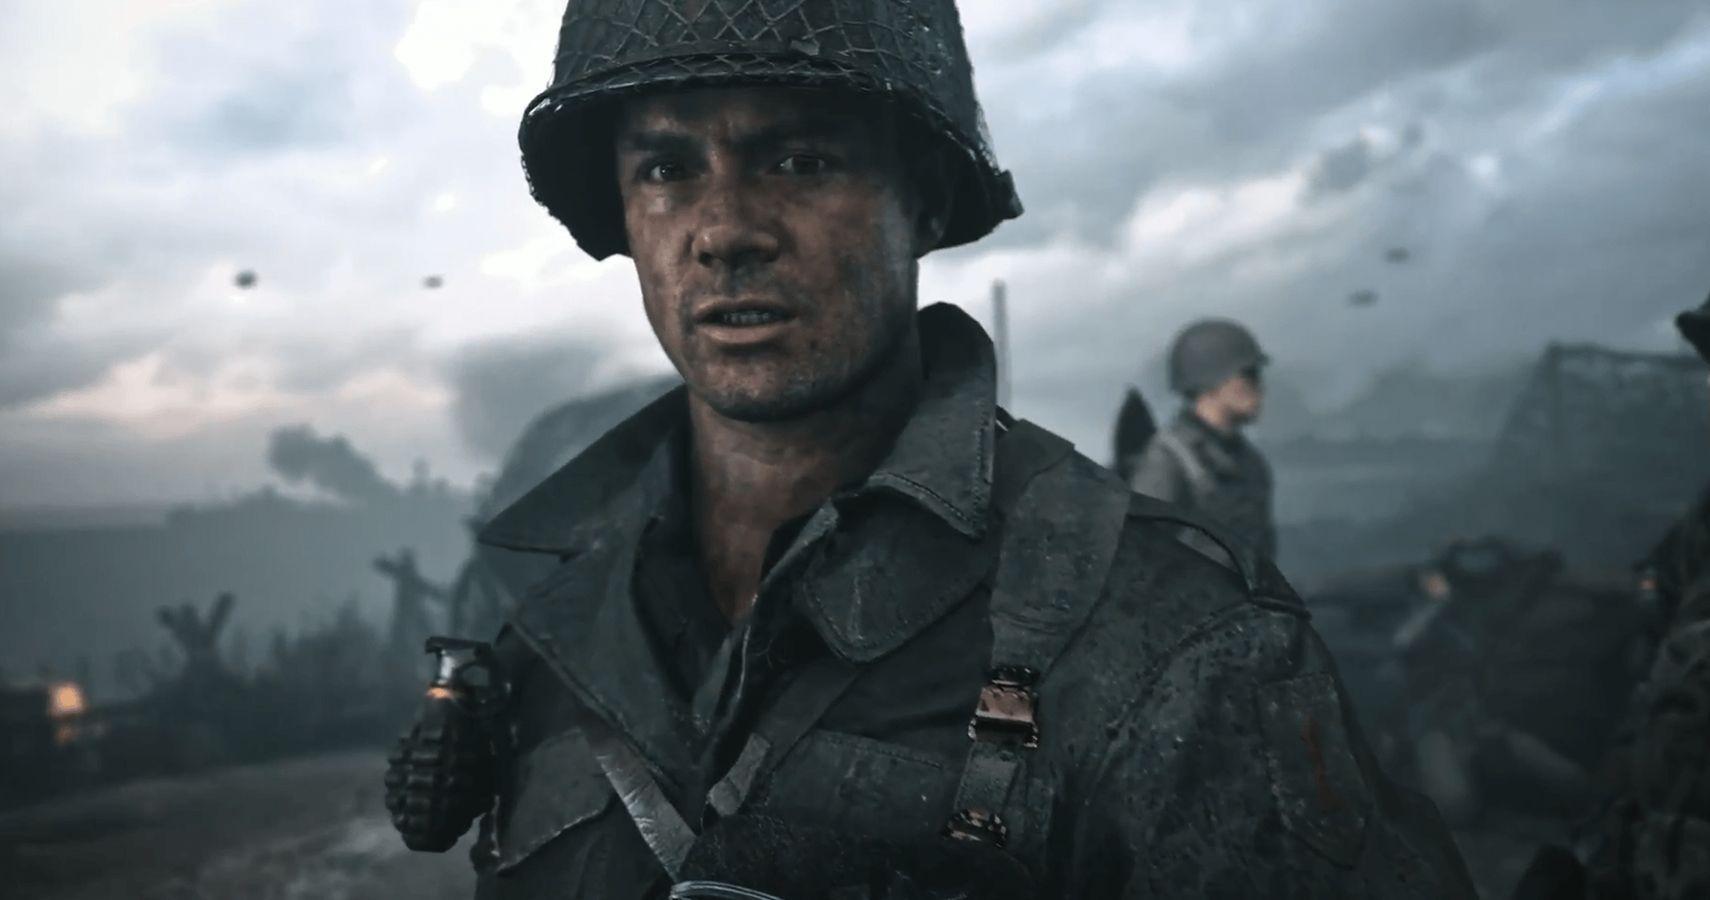 Rumor: Call of Duty 2021's Working Title Is WWII: Vanguard